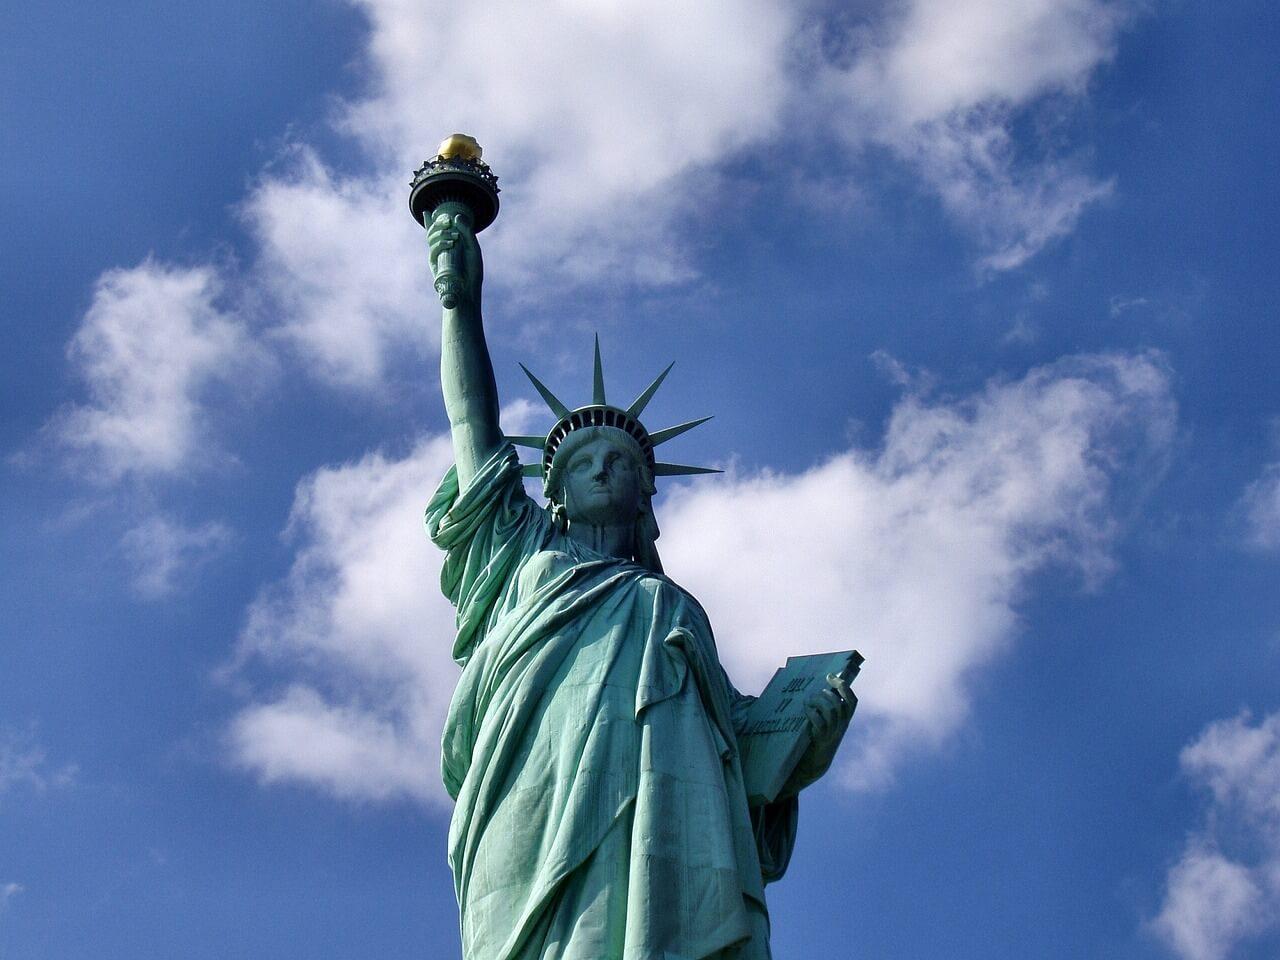 statue-of-liberty-1045266_1280